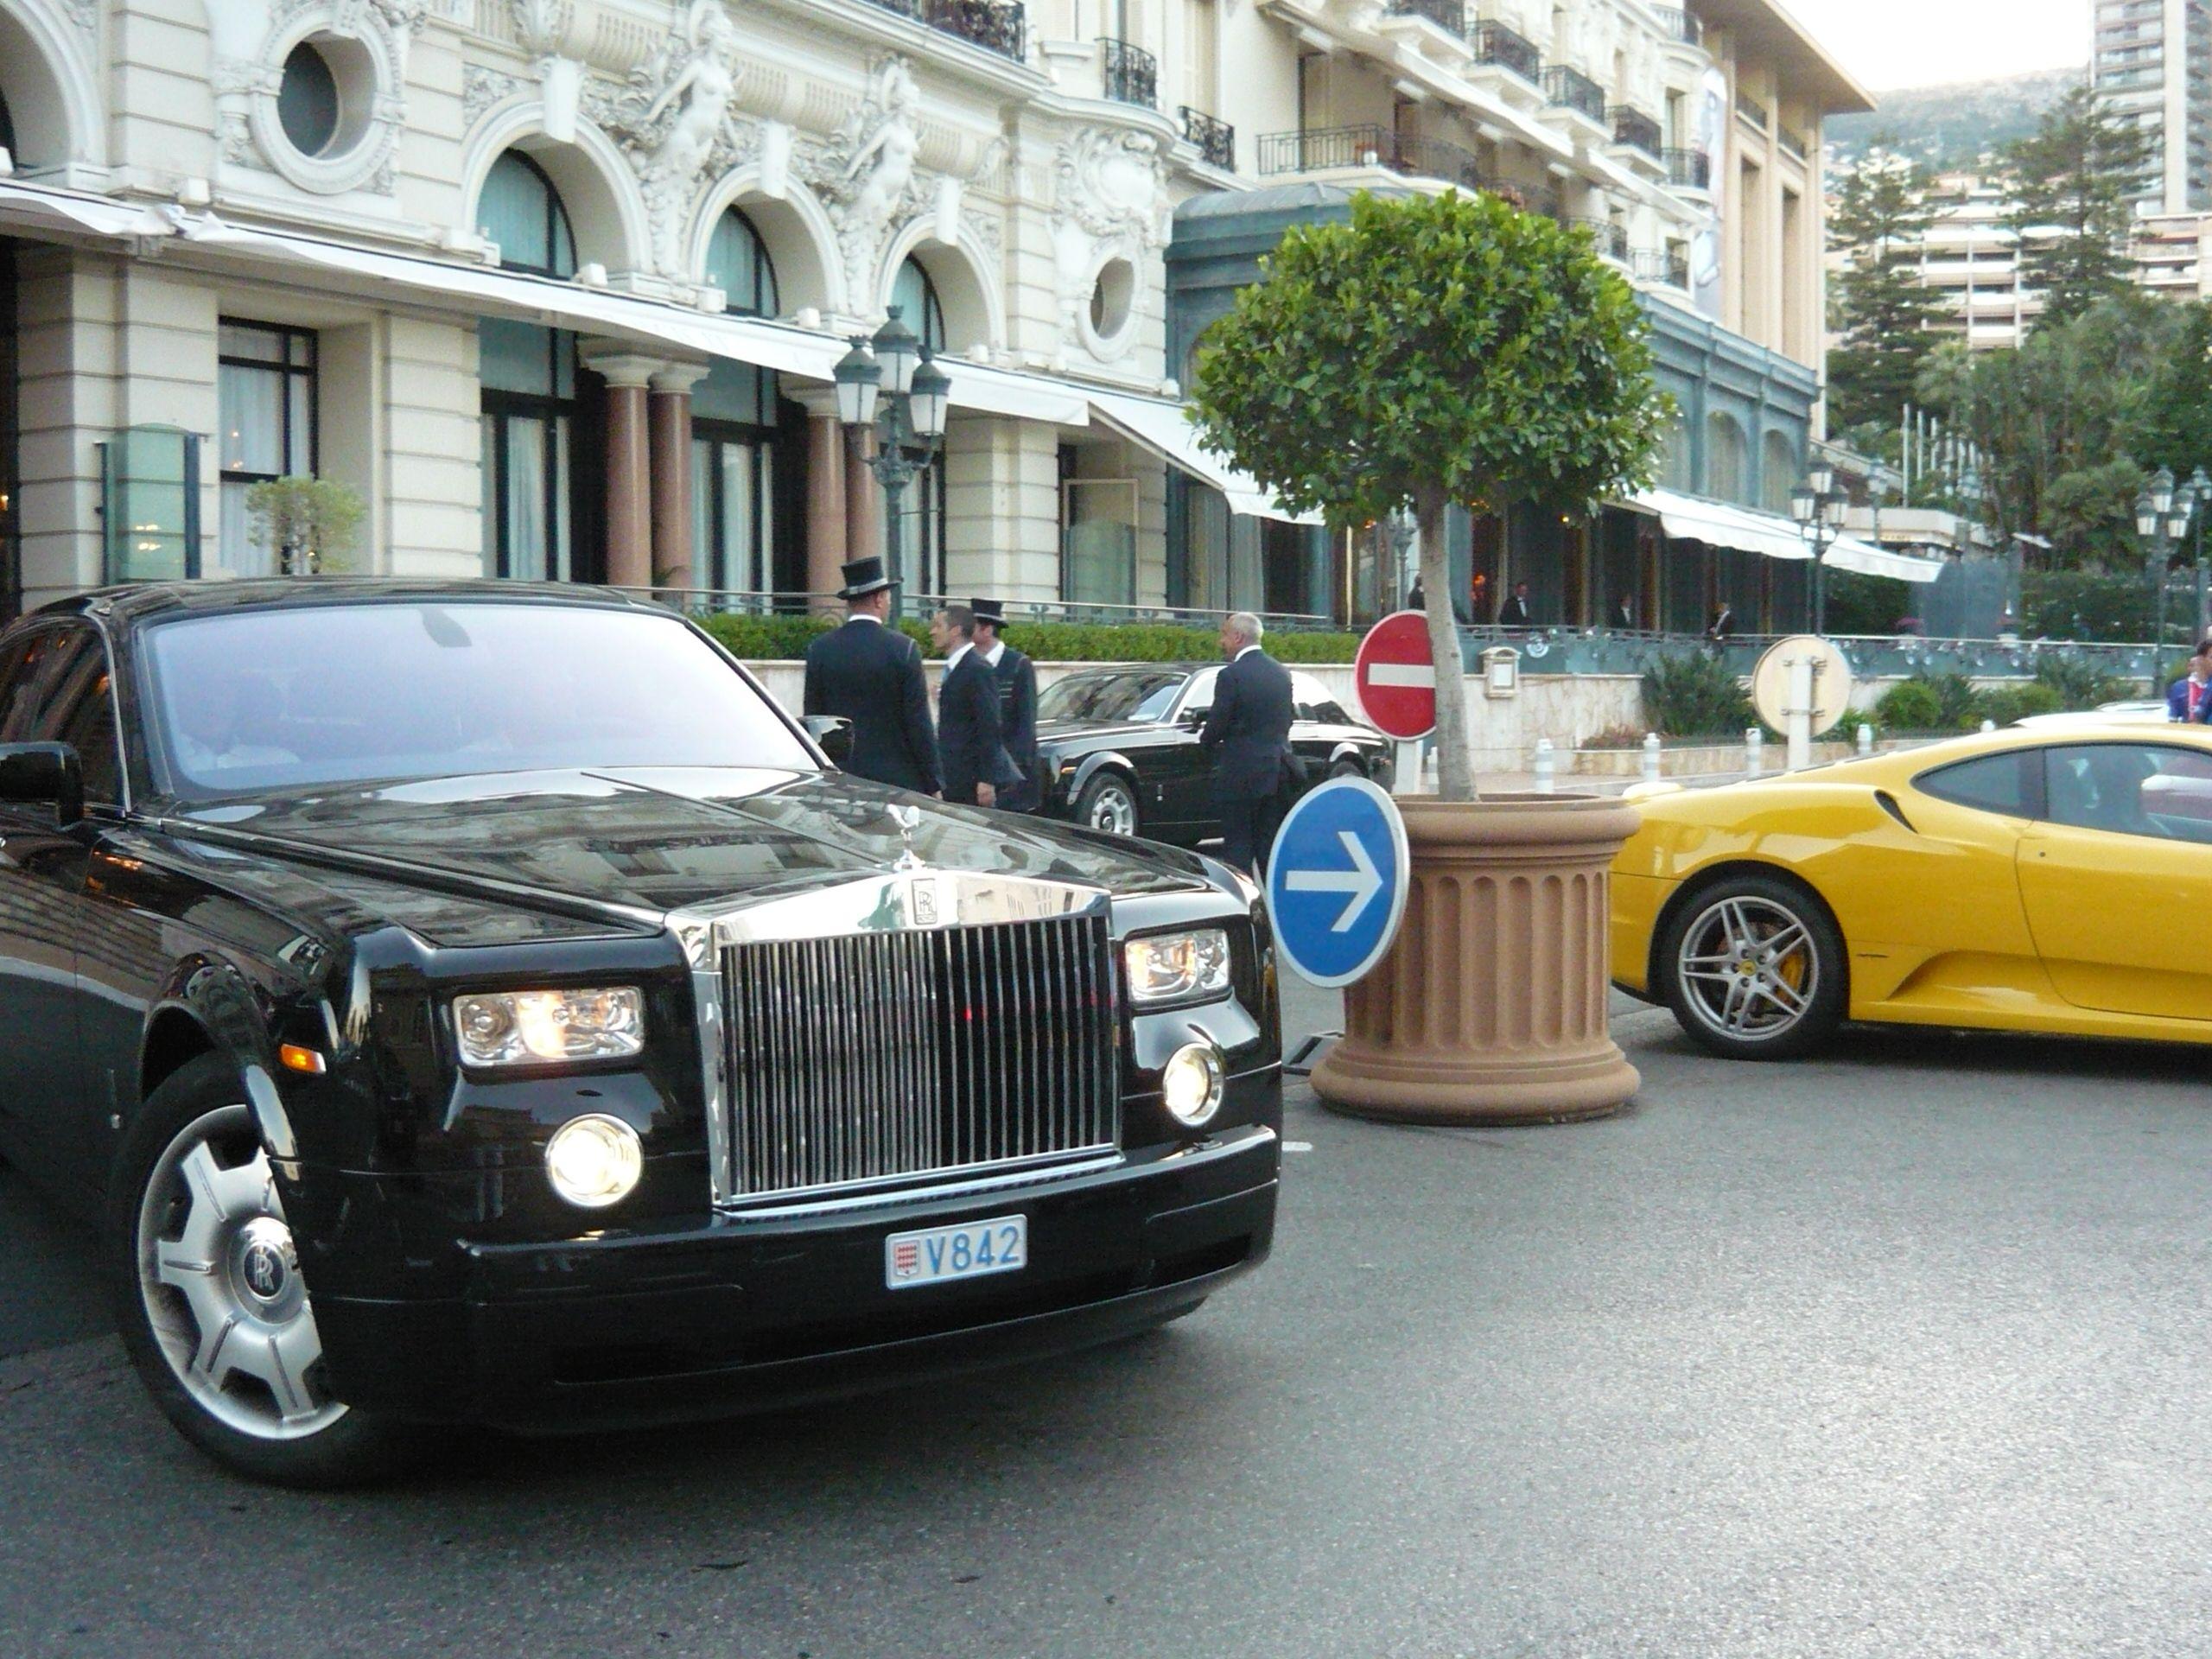 Doormen Waiting For Luxury Cars To Park In Front Of Hotel De Paris In Monte Carlo Monaco Monaco Saint Martin Vesubie Villefranche Sur Mer